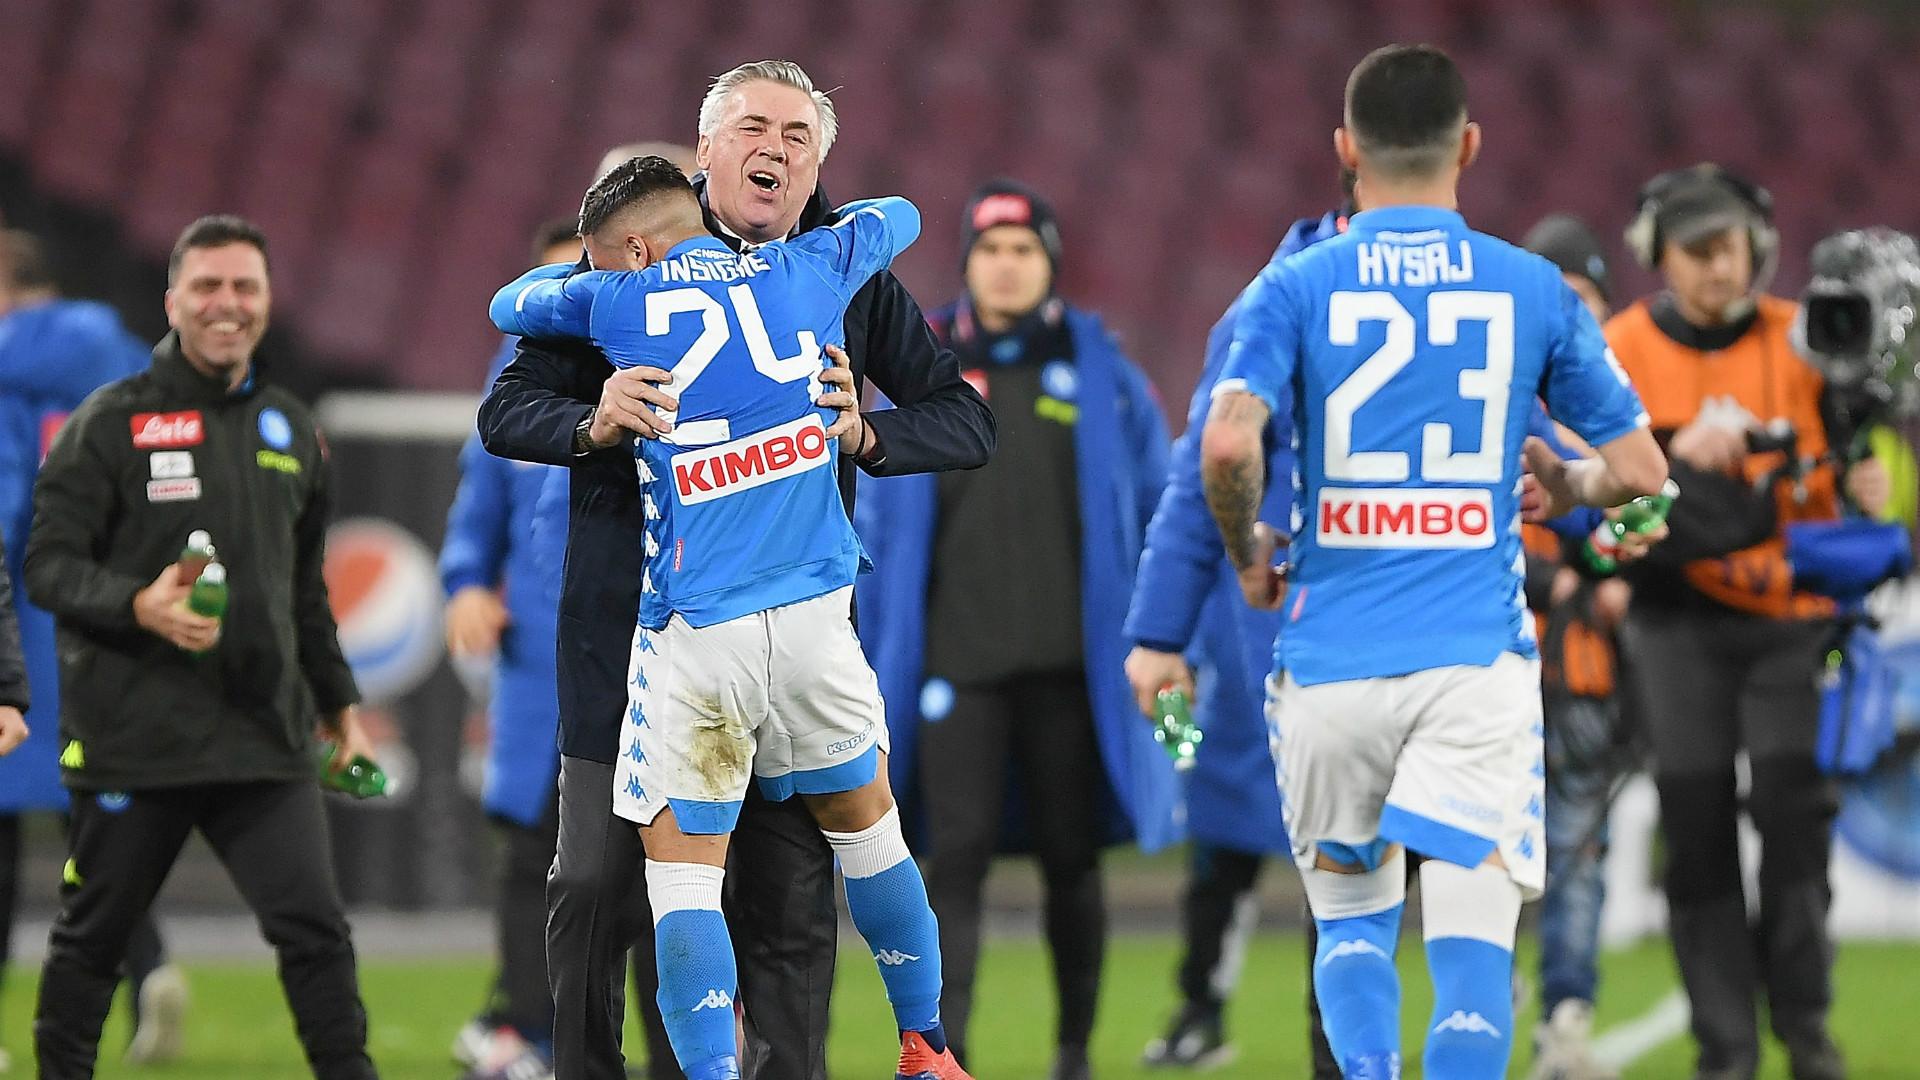 Fiorentina vs napoli betting preview goal cfd investopedia video on betting